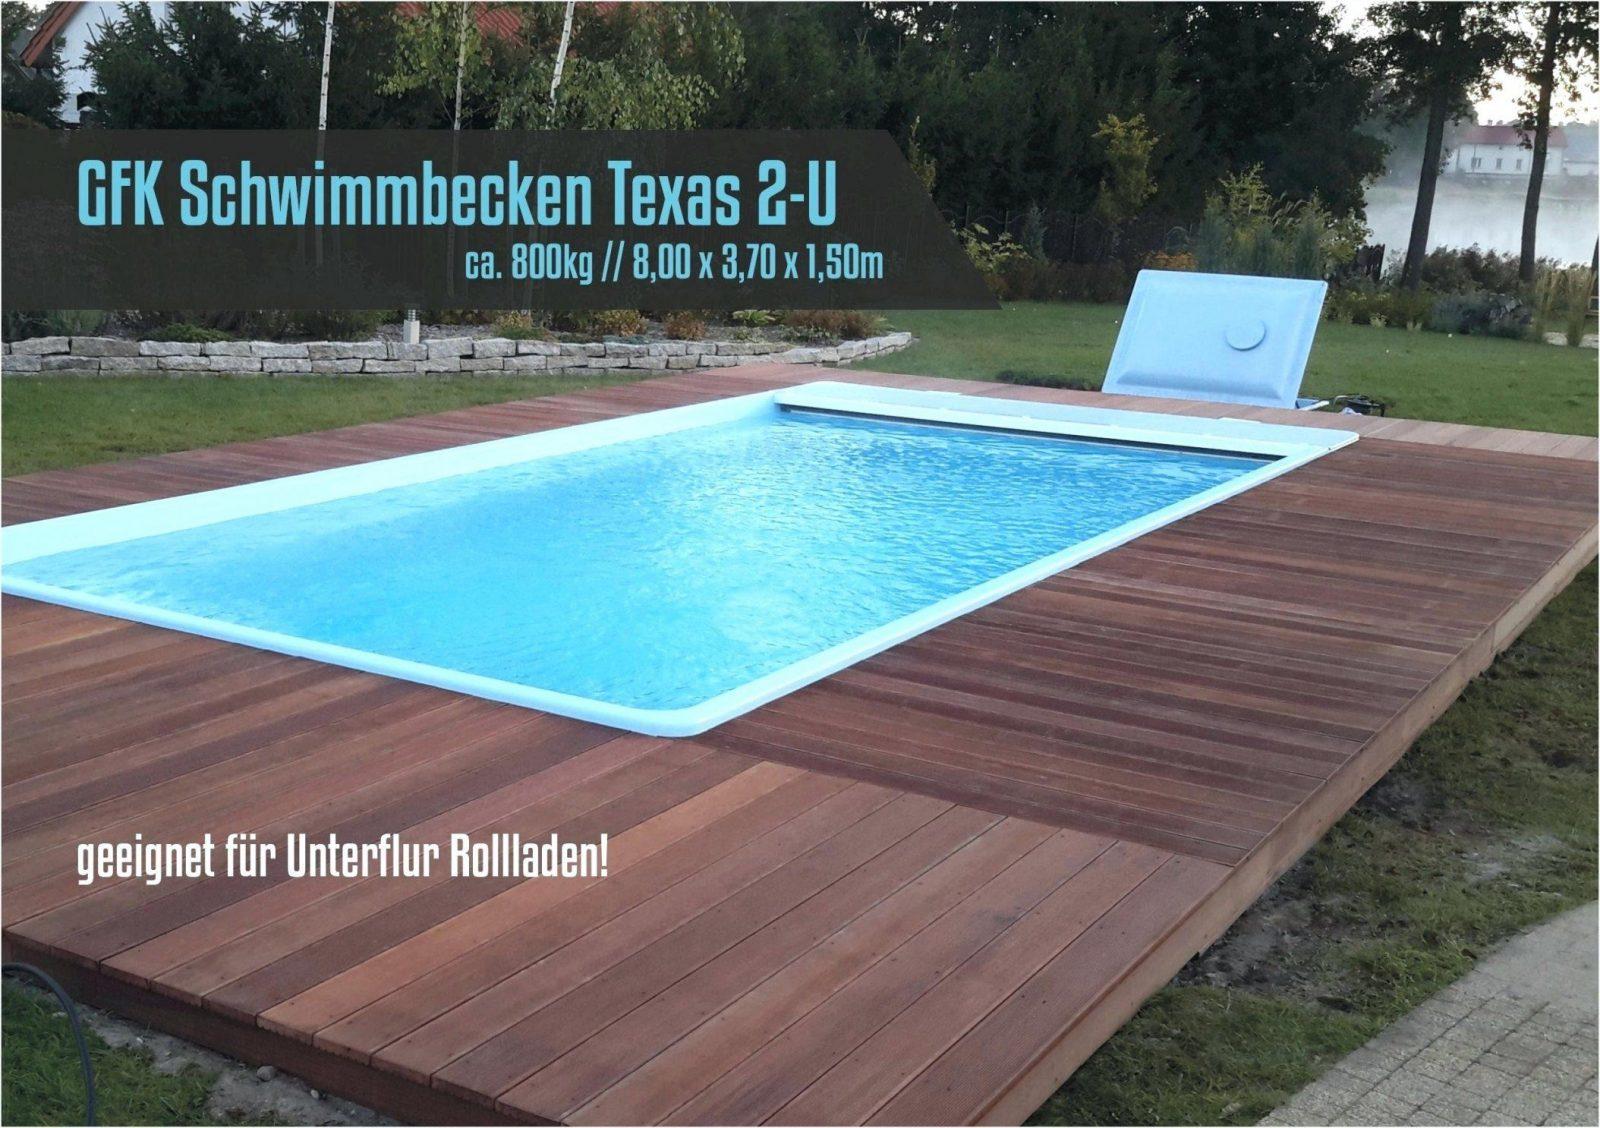 Pool berdachung eigenbau pool und schwimmbad selber bauen kudo aus unserem forum pool - Pool rutsche selber bauen ...